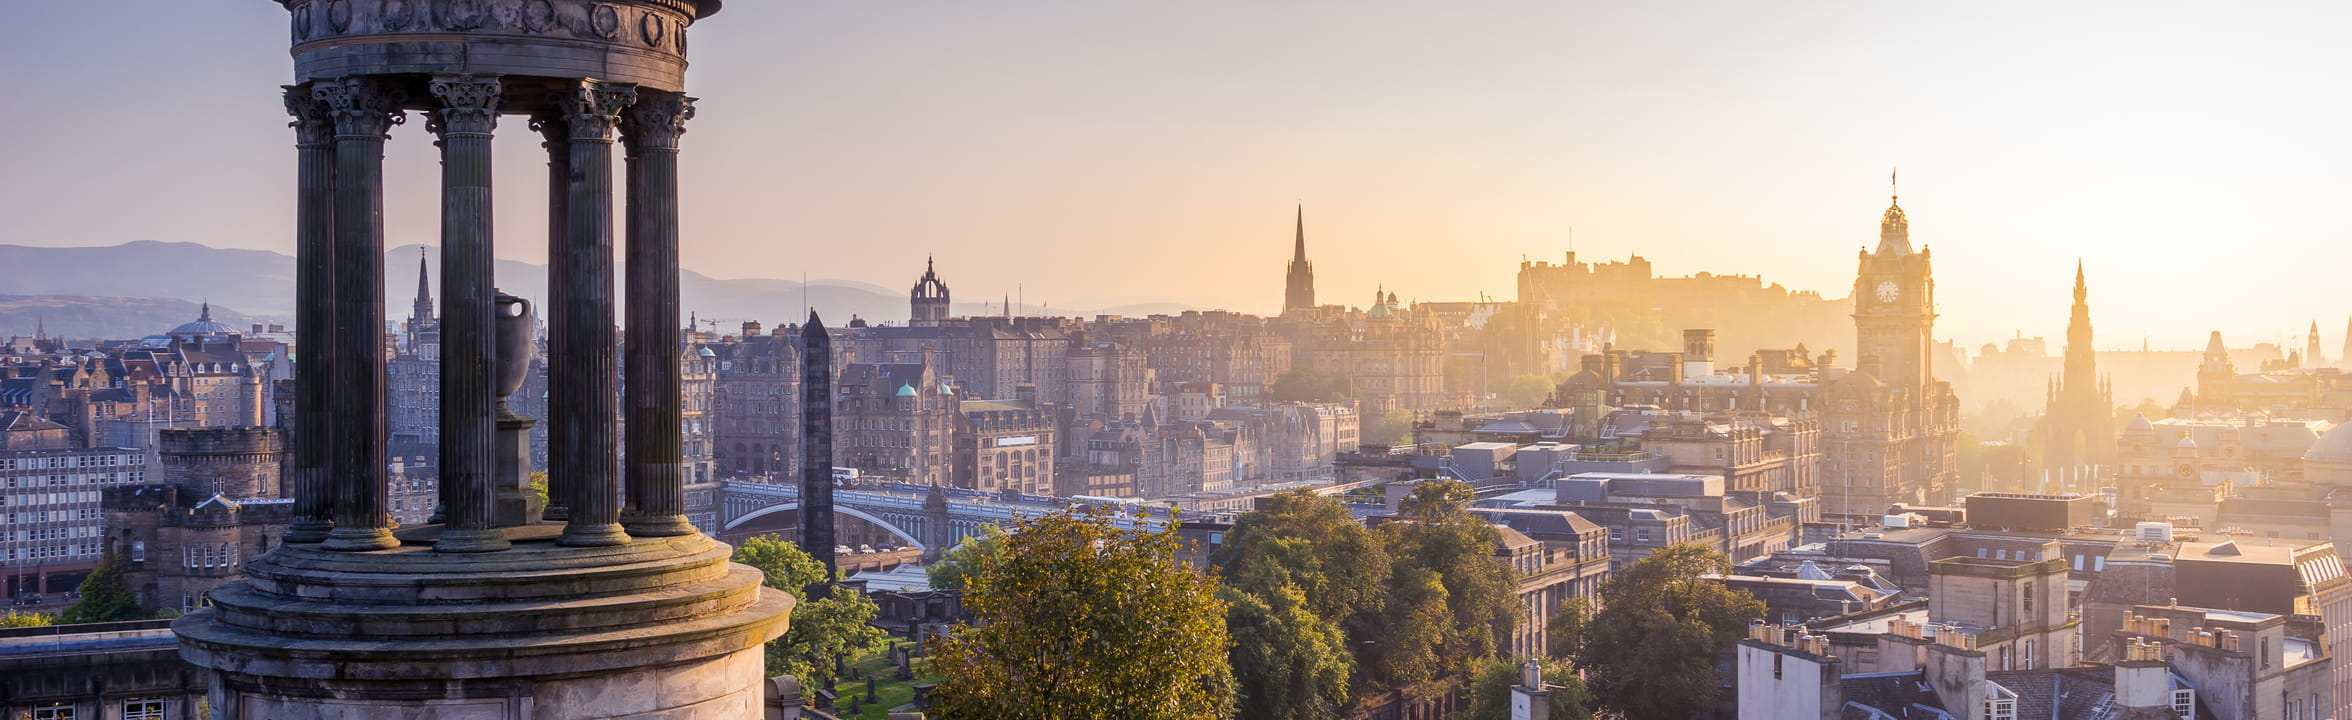 UK Edinburgh